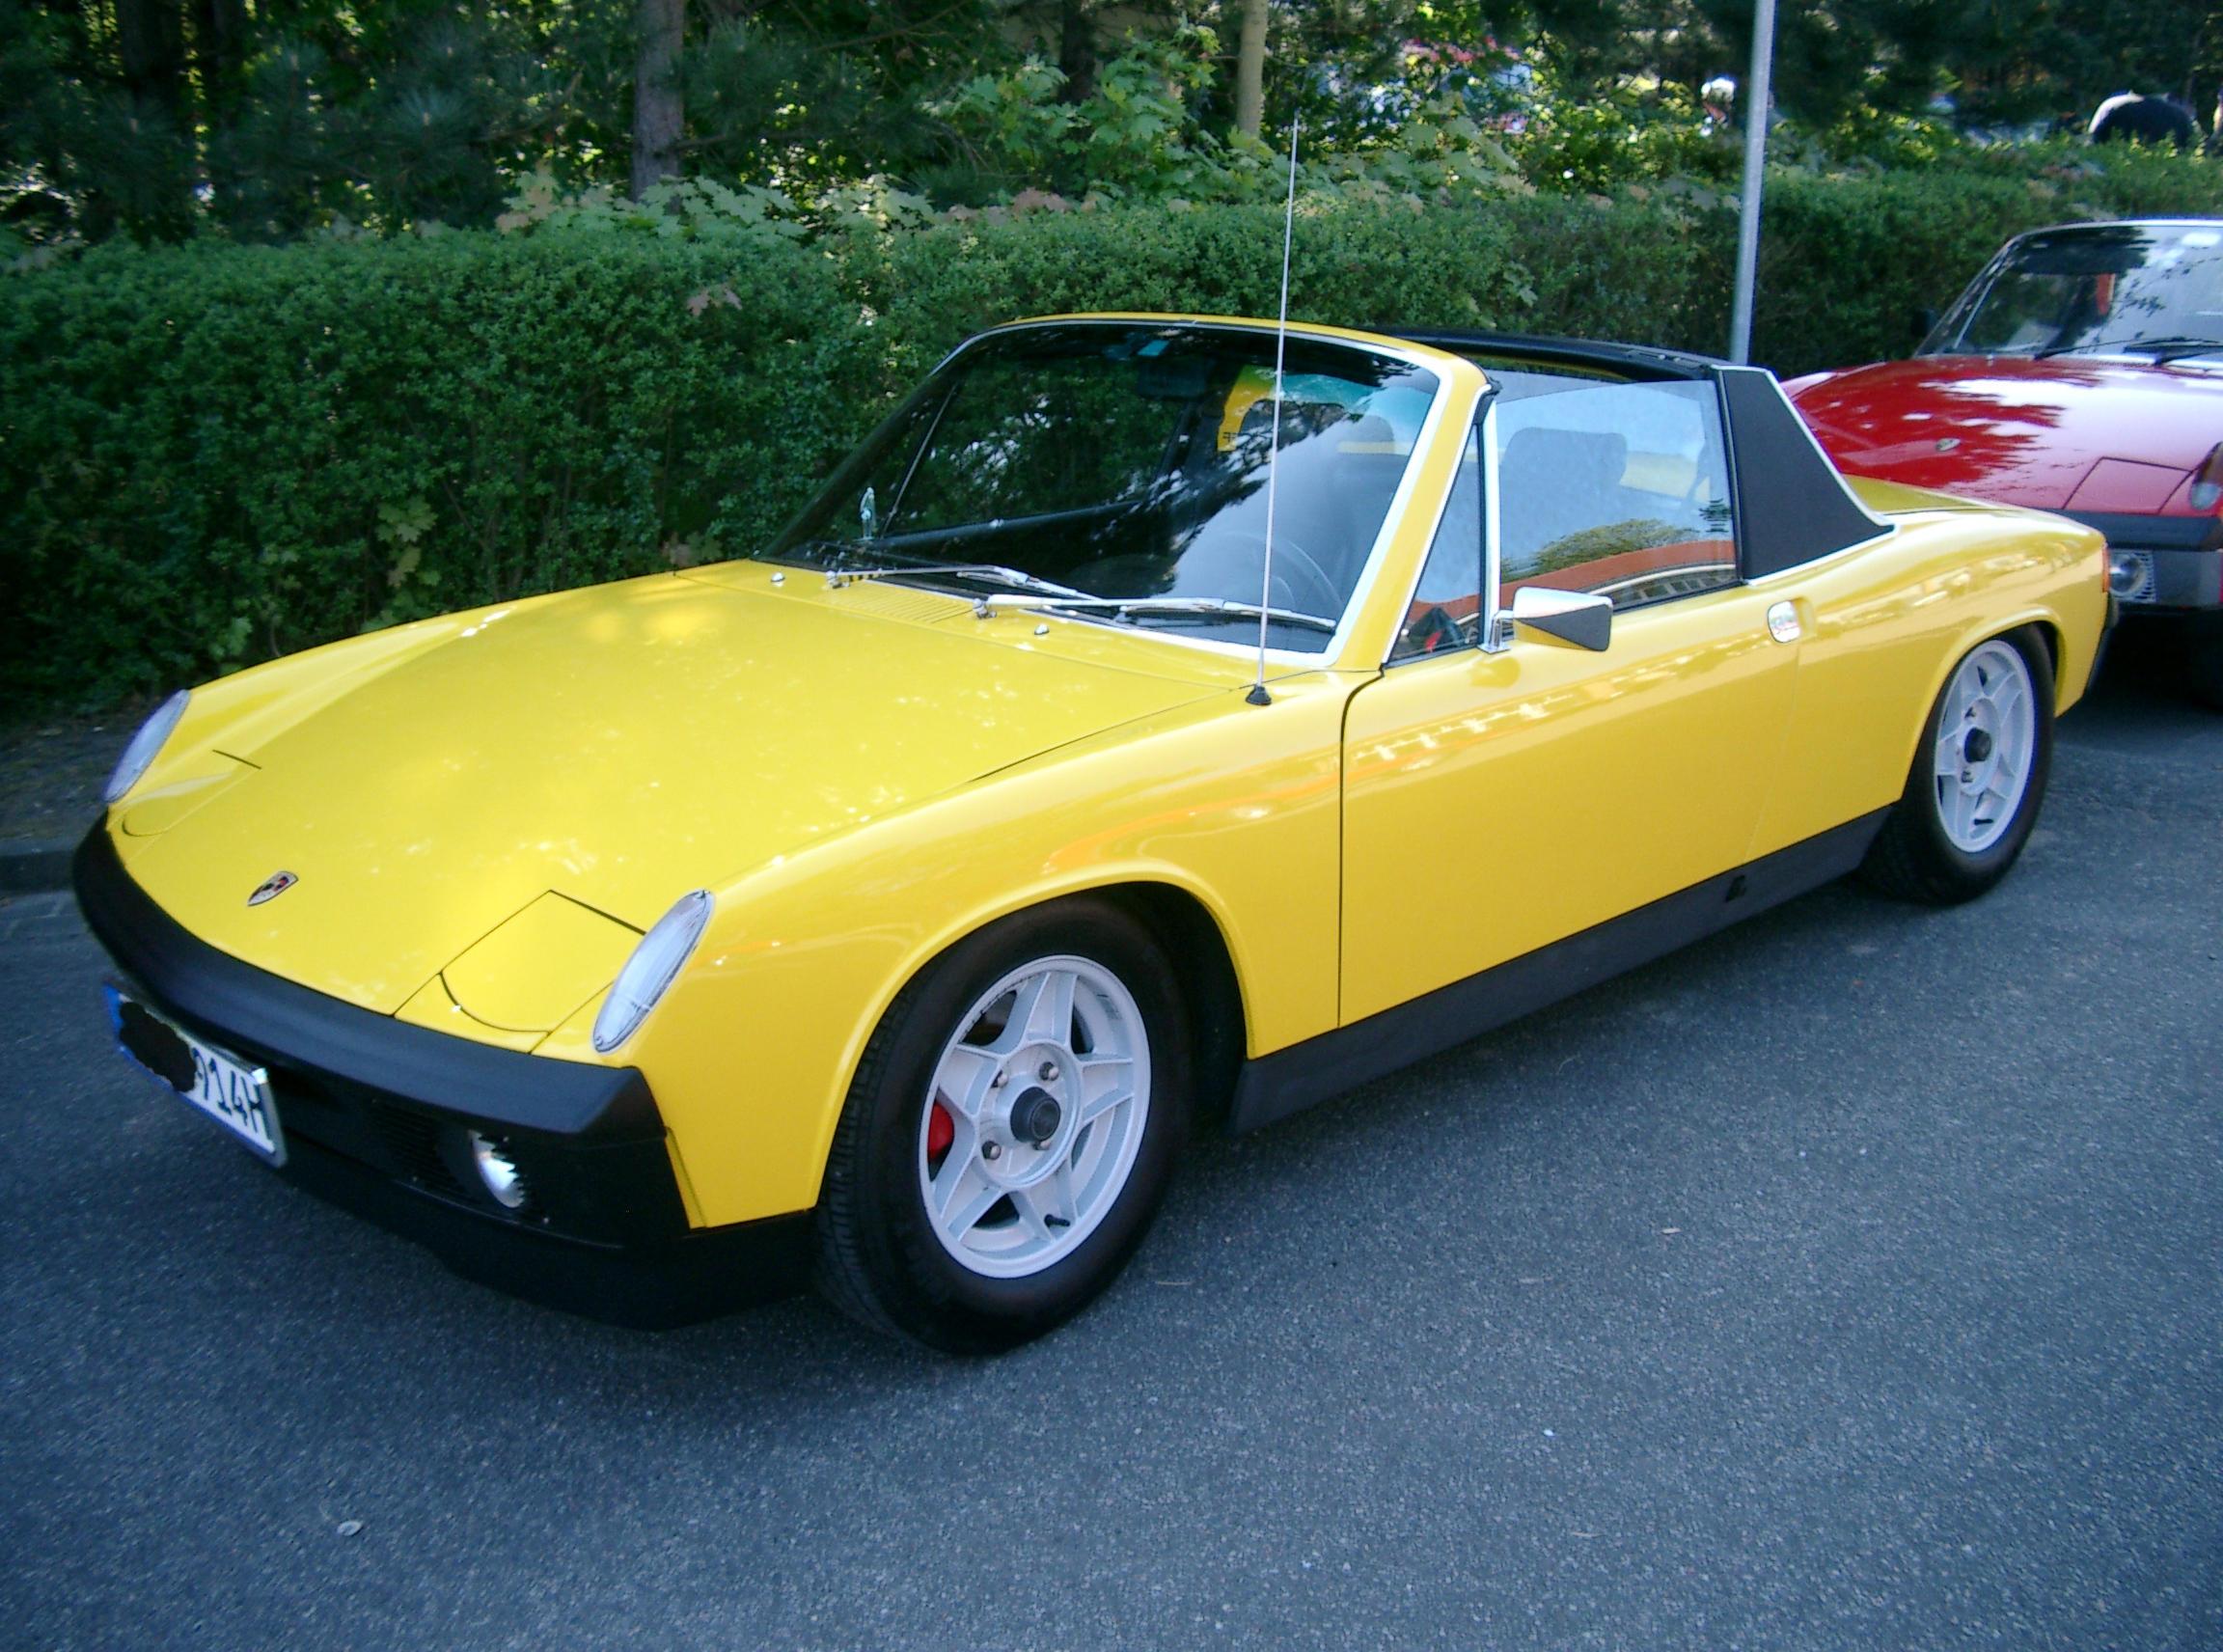 File:VW-Porsche-914.jpg